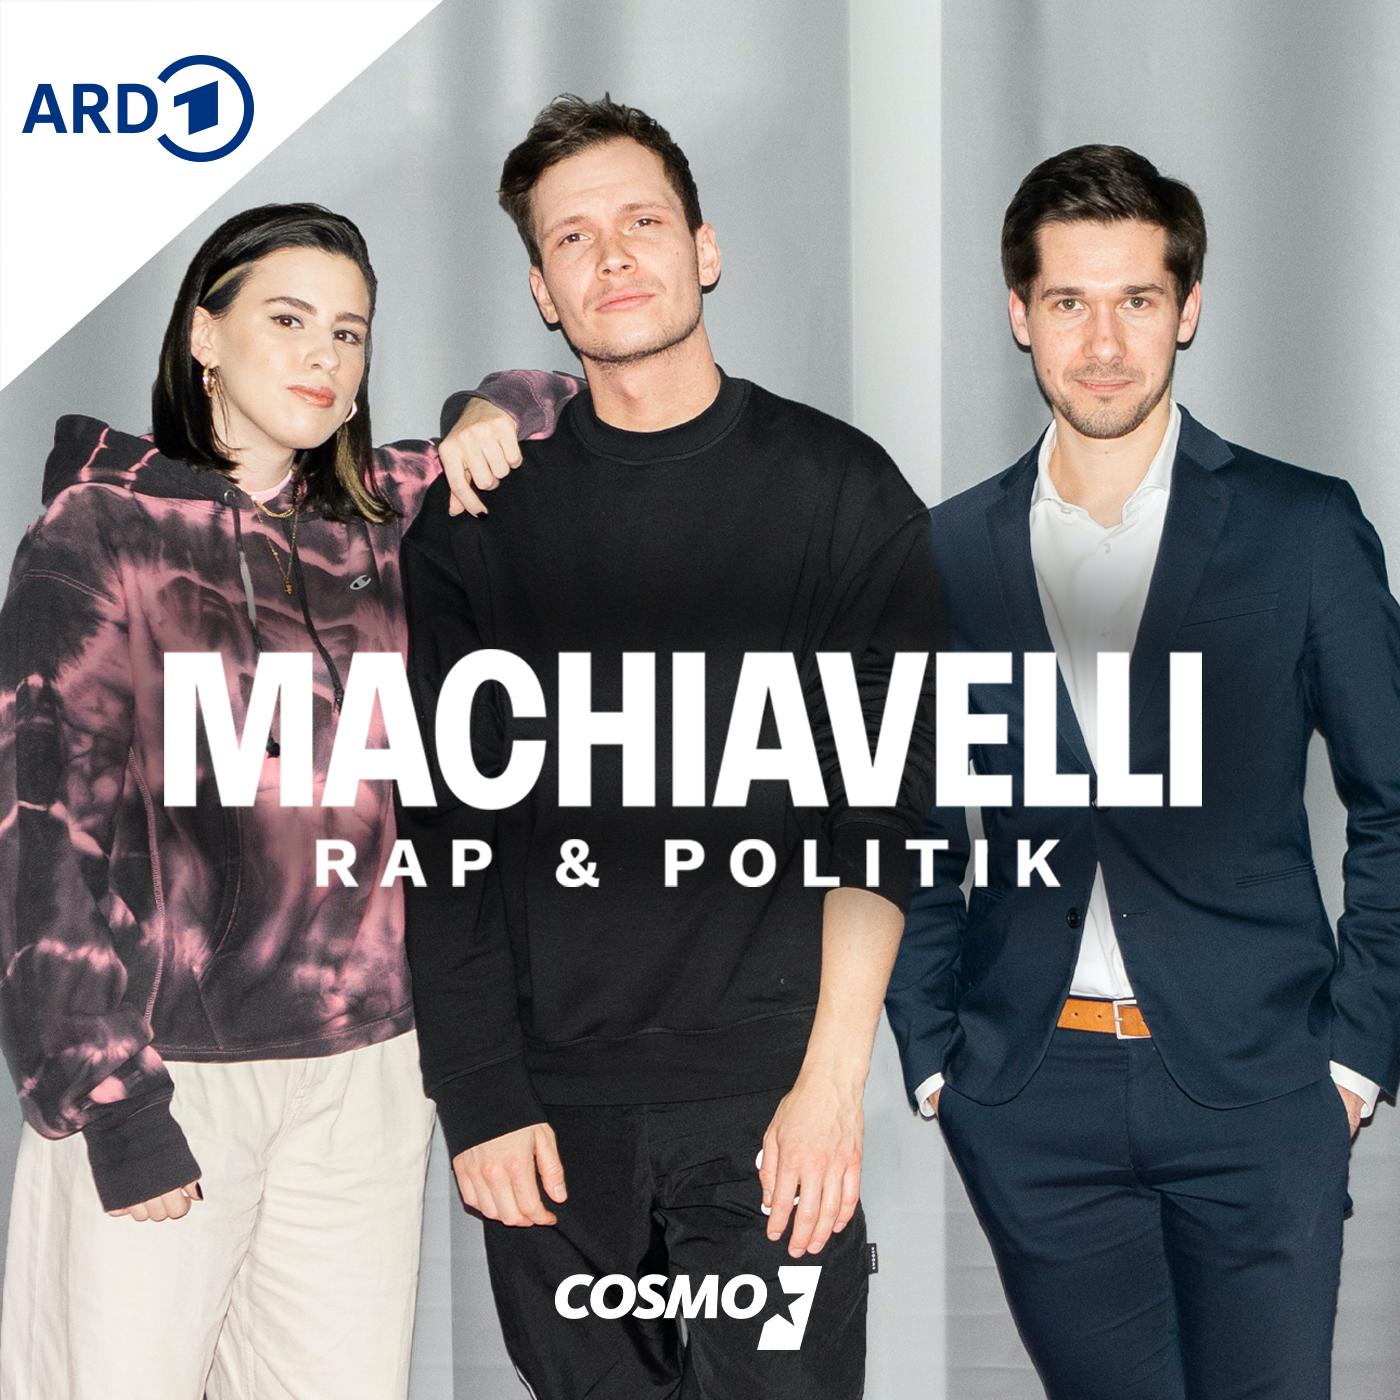 COSMO Machiavelli - Rap und Politik